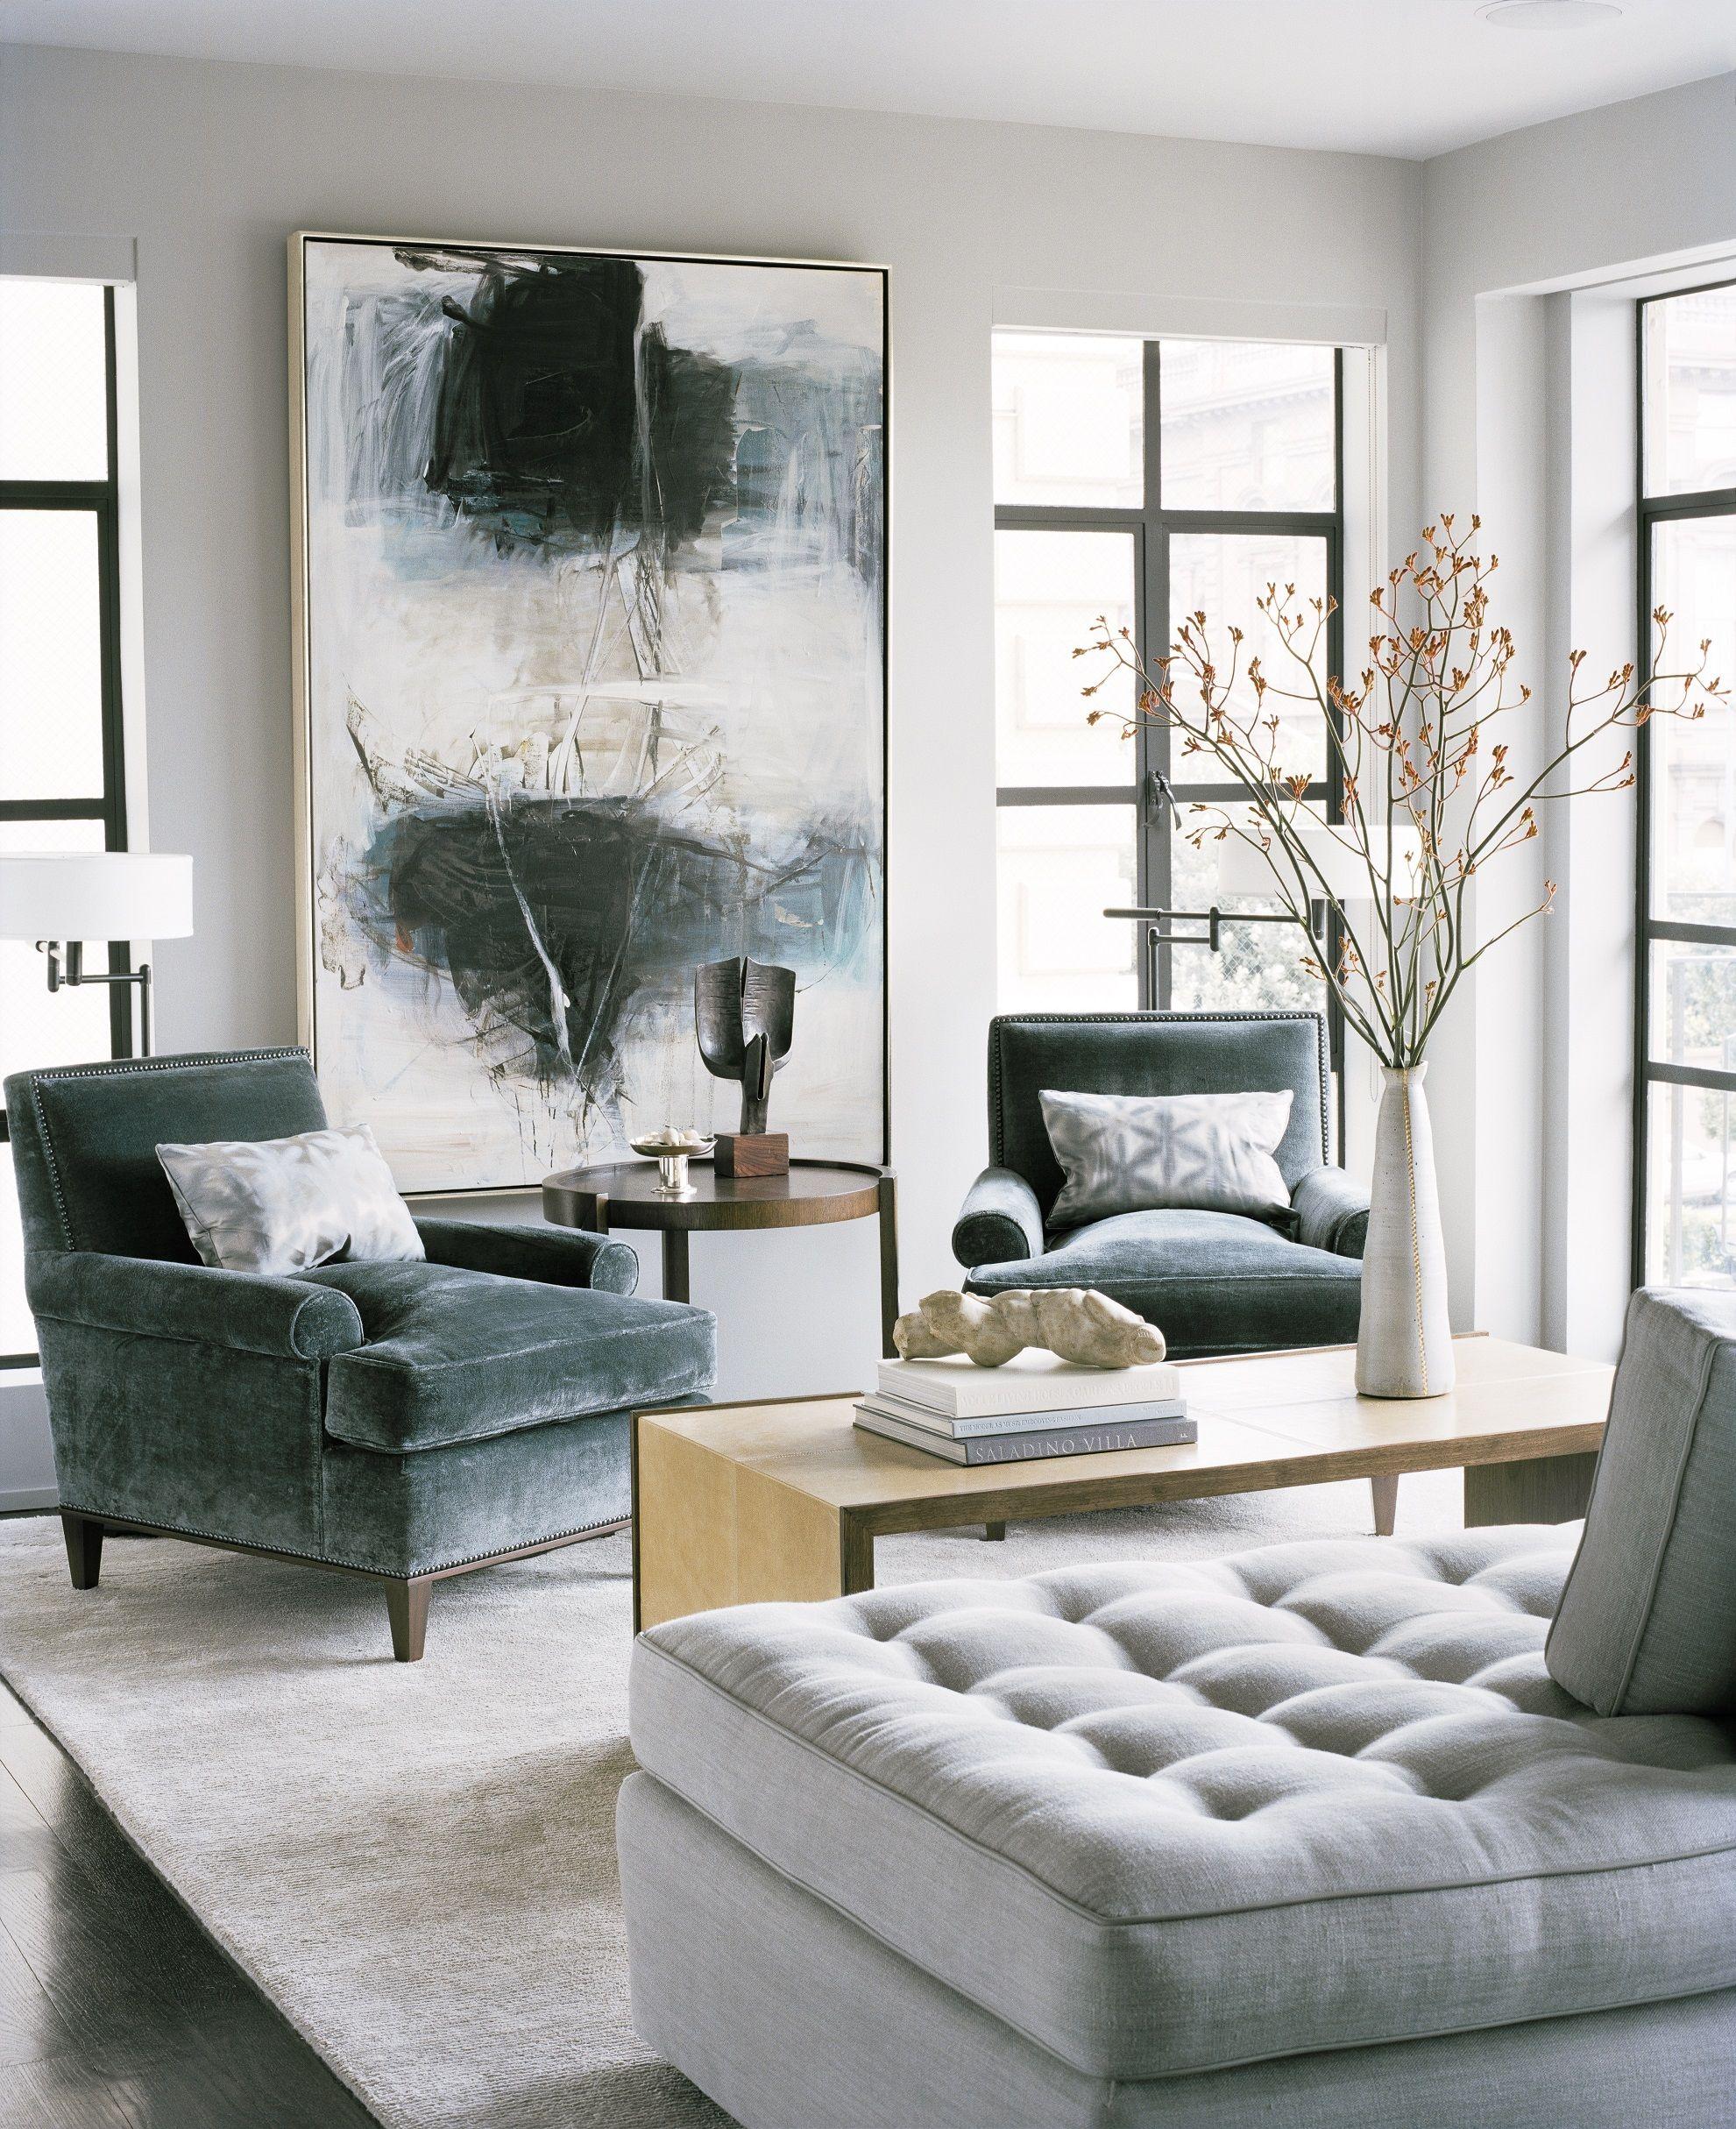 Matthew Leverone Design | velvet | Arredamento grigio, Idee per ...